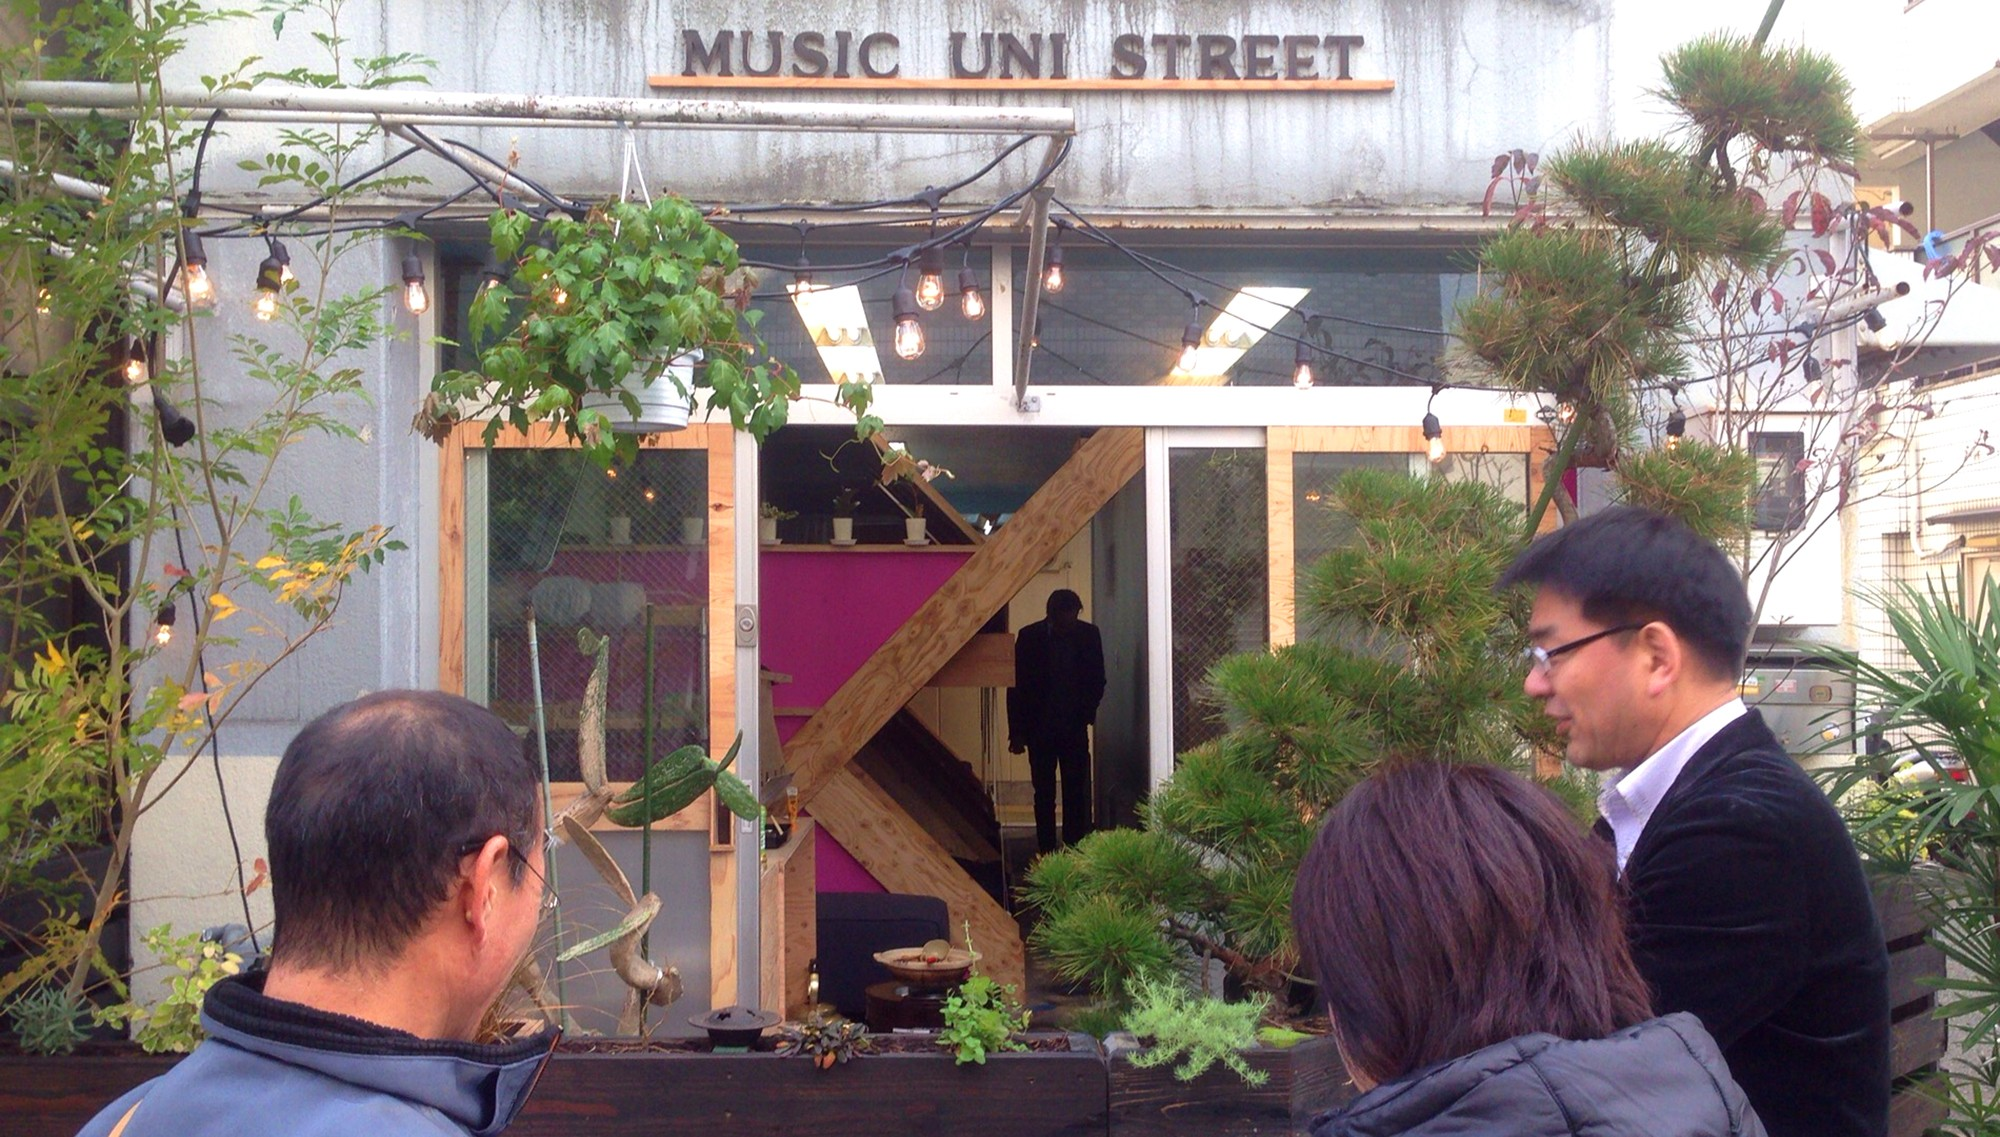 Music Uni Street Backpackers Hostel (14個のBEDが見えるファサード)